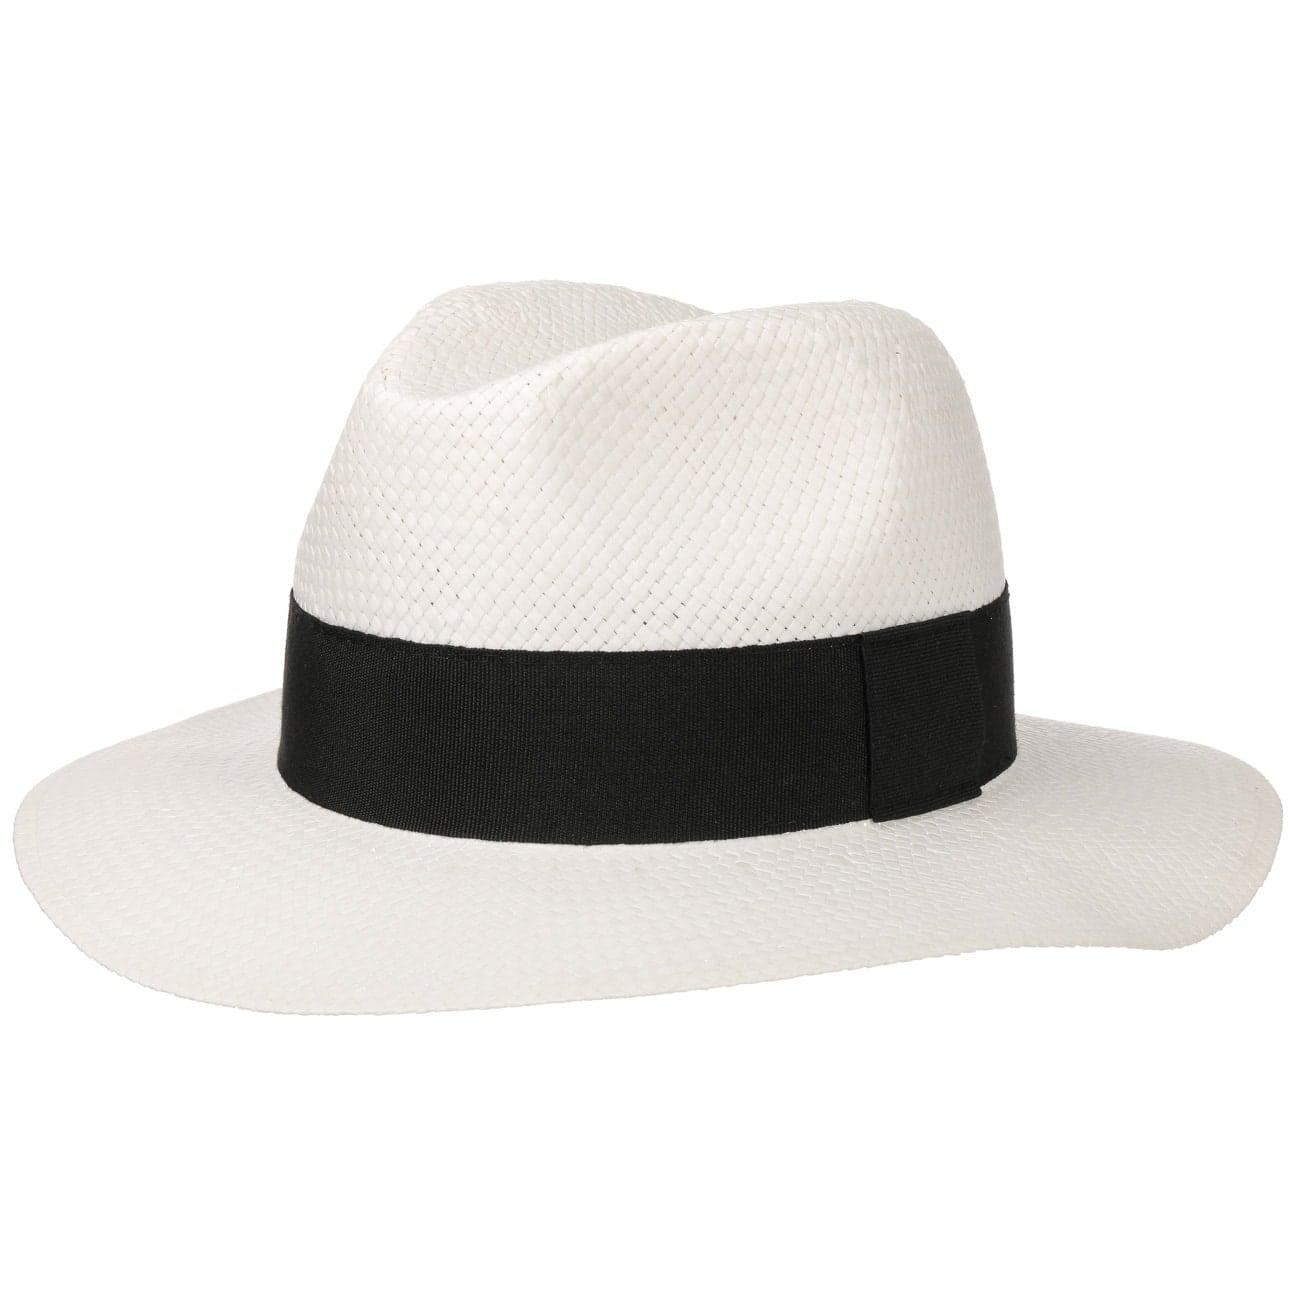 Chapeau White Night Traveller by Lipodo  chapeau en paille